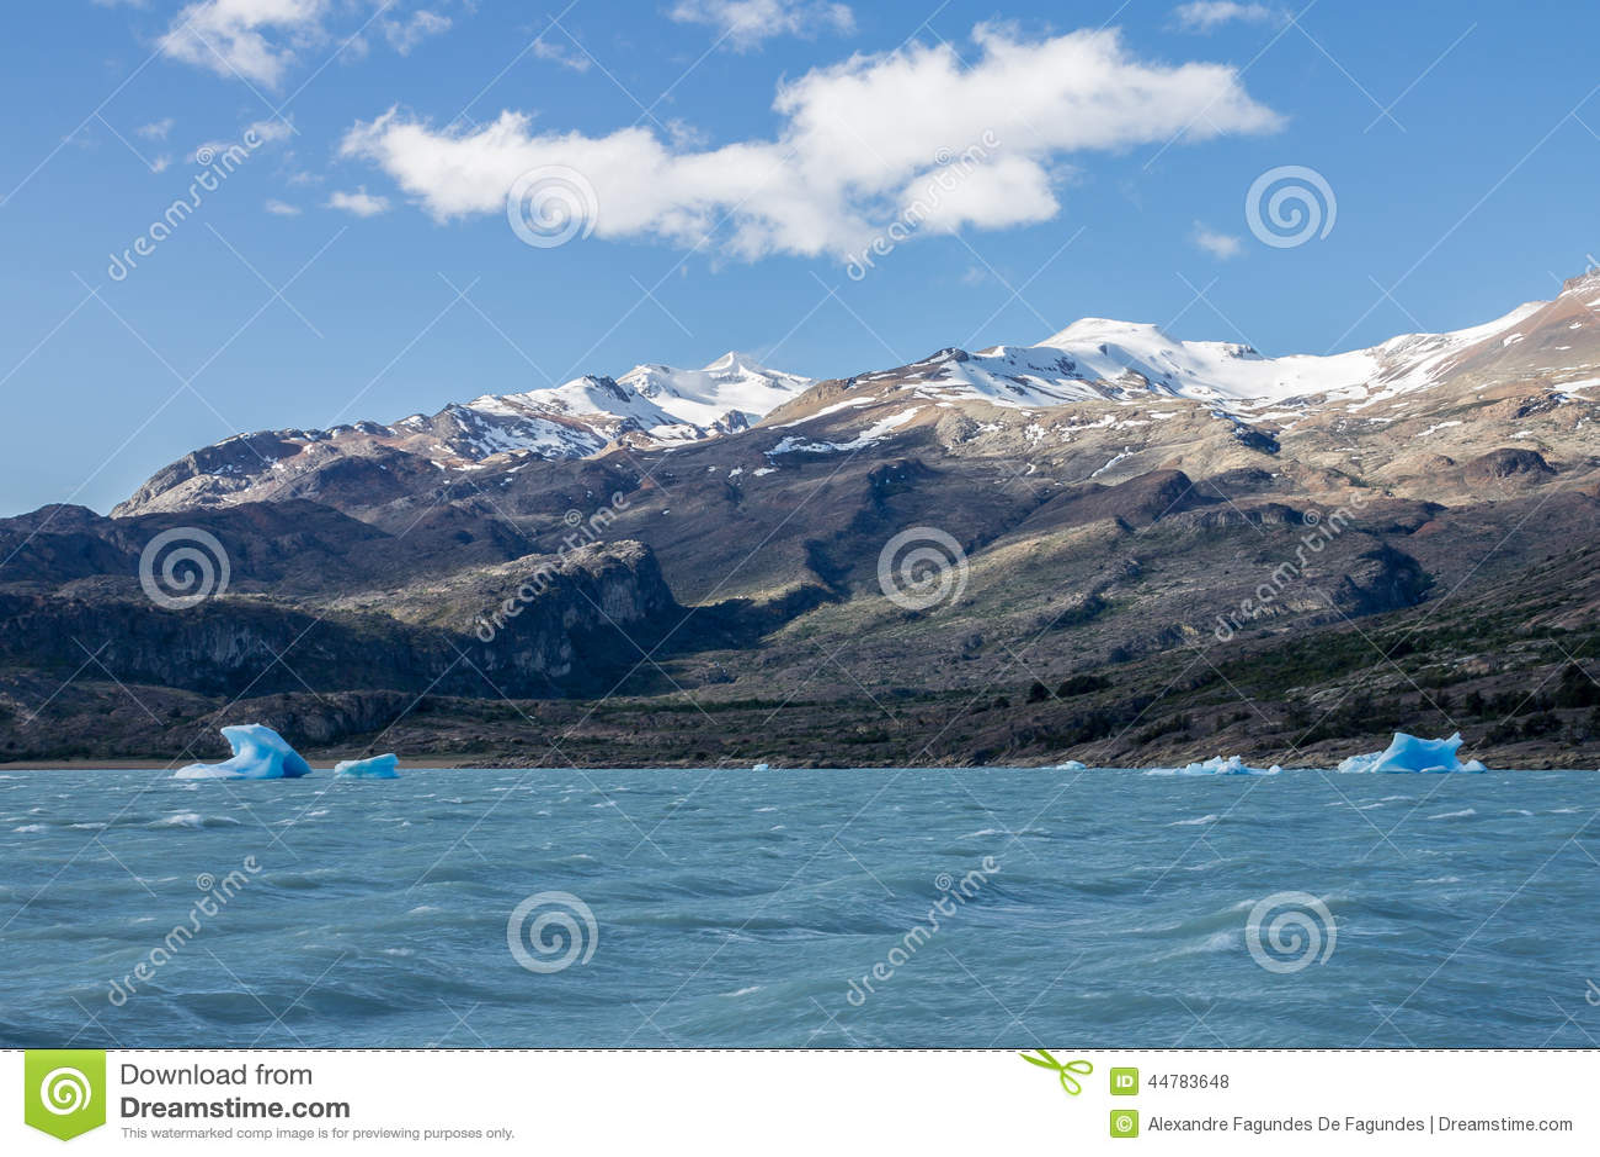 argentino lake el calafate argentina stock photo image snow vector overlay snow vector pattern